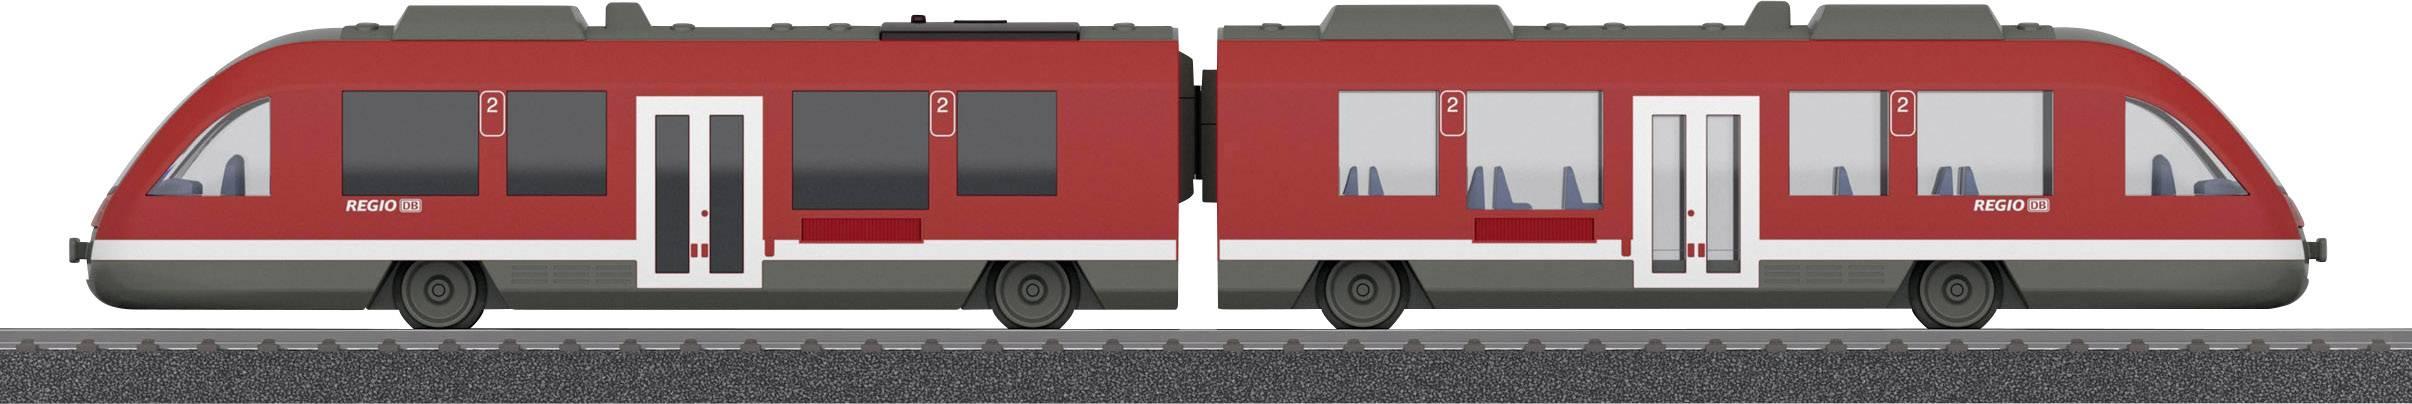 H0 osobný vlak s akumulátorom Märklin World 36100